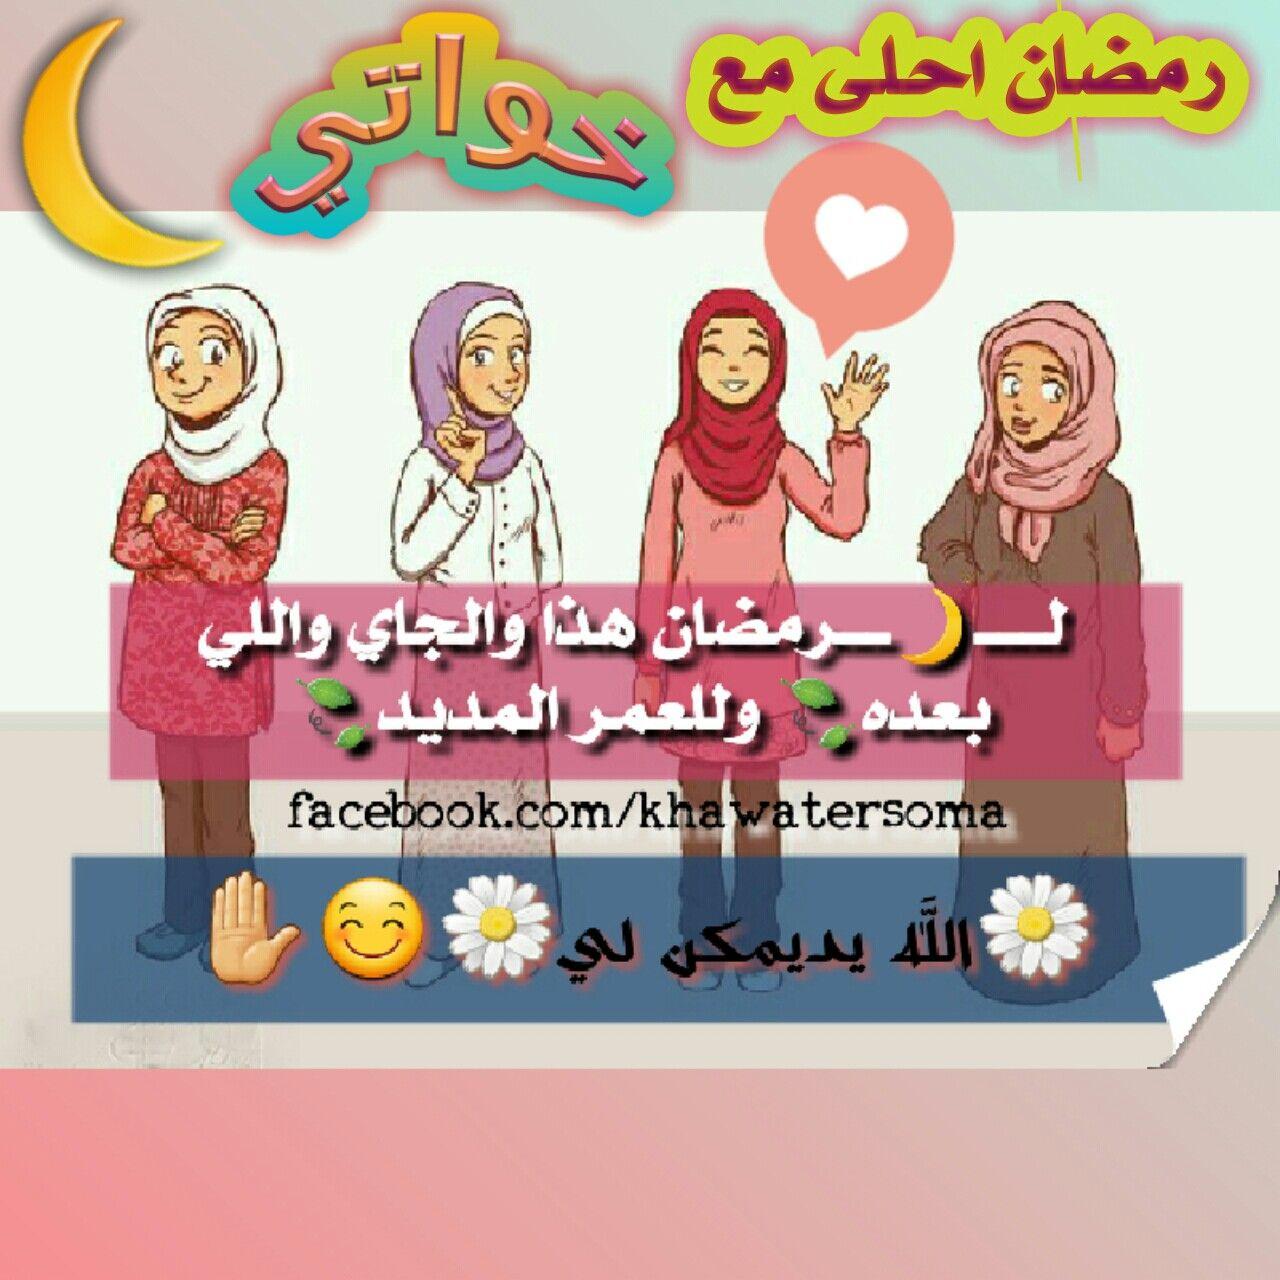 رمضان احلى مع خواتي Cute Quotes Family Guy Comics